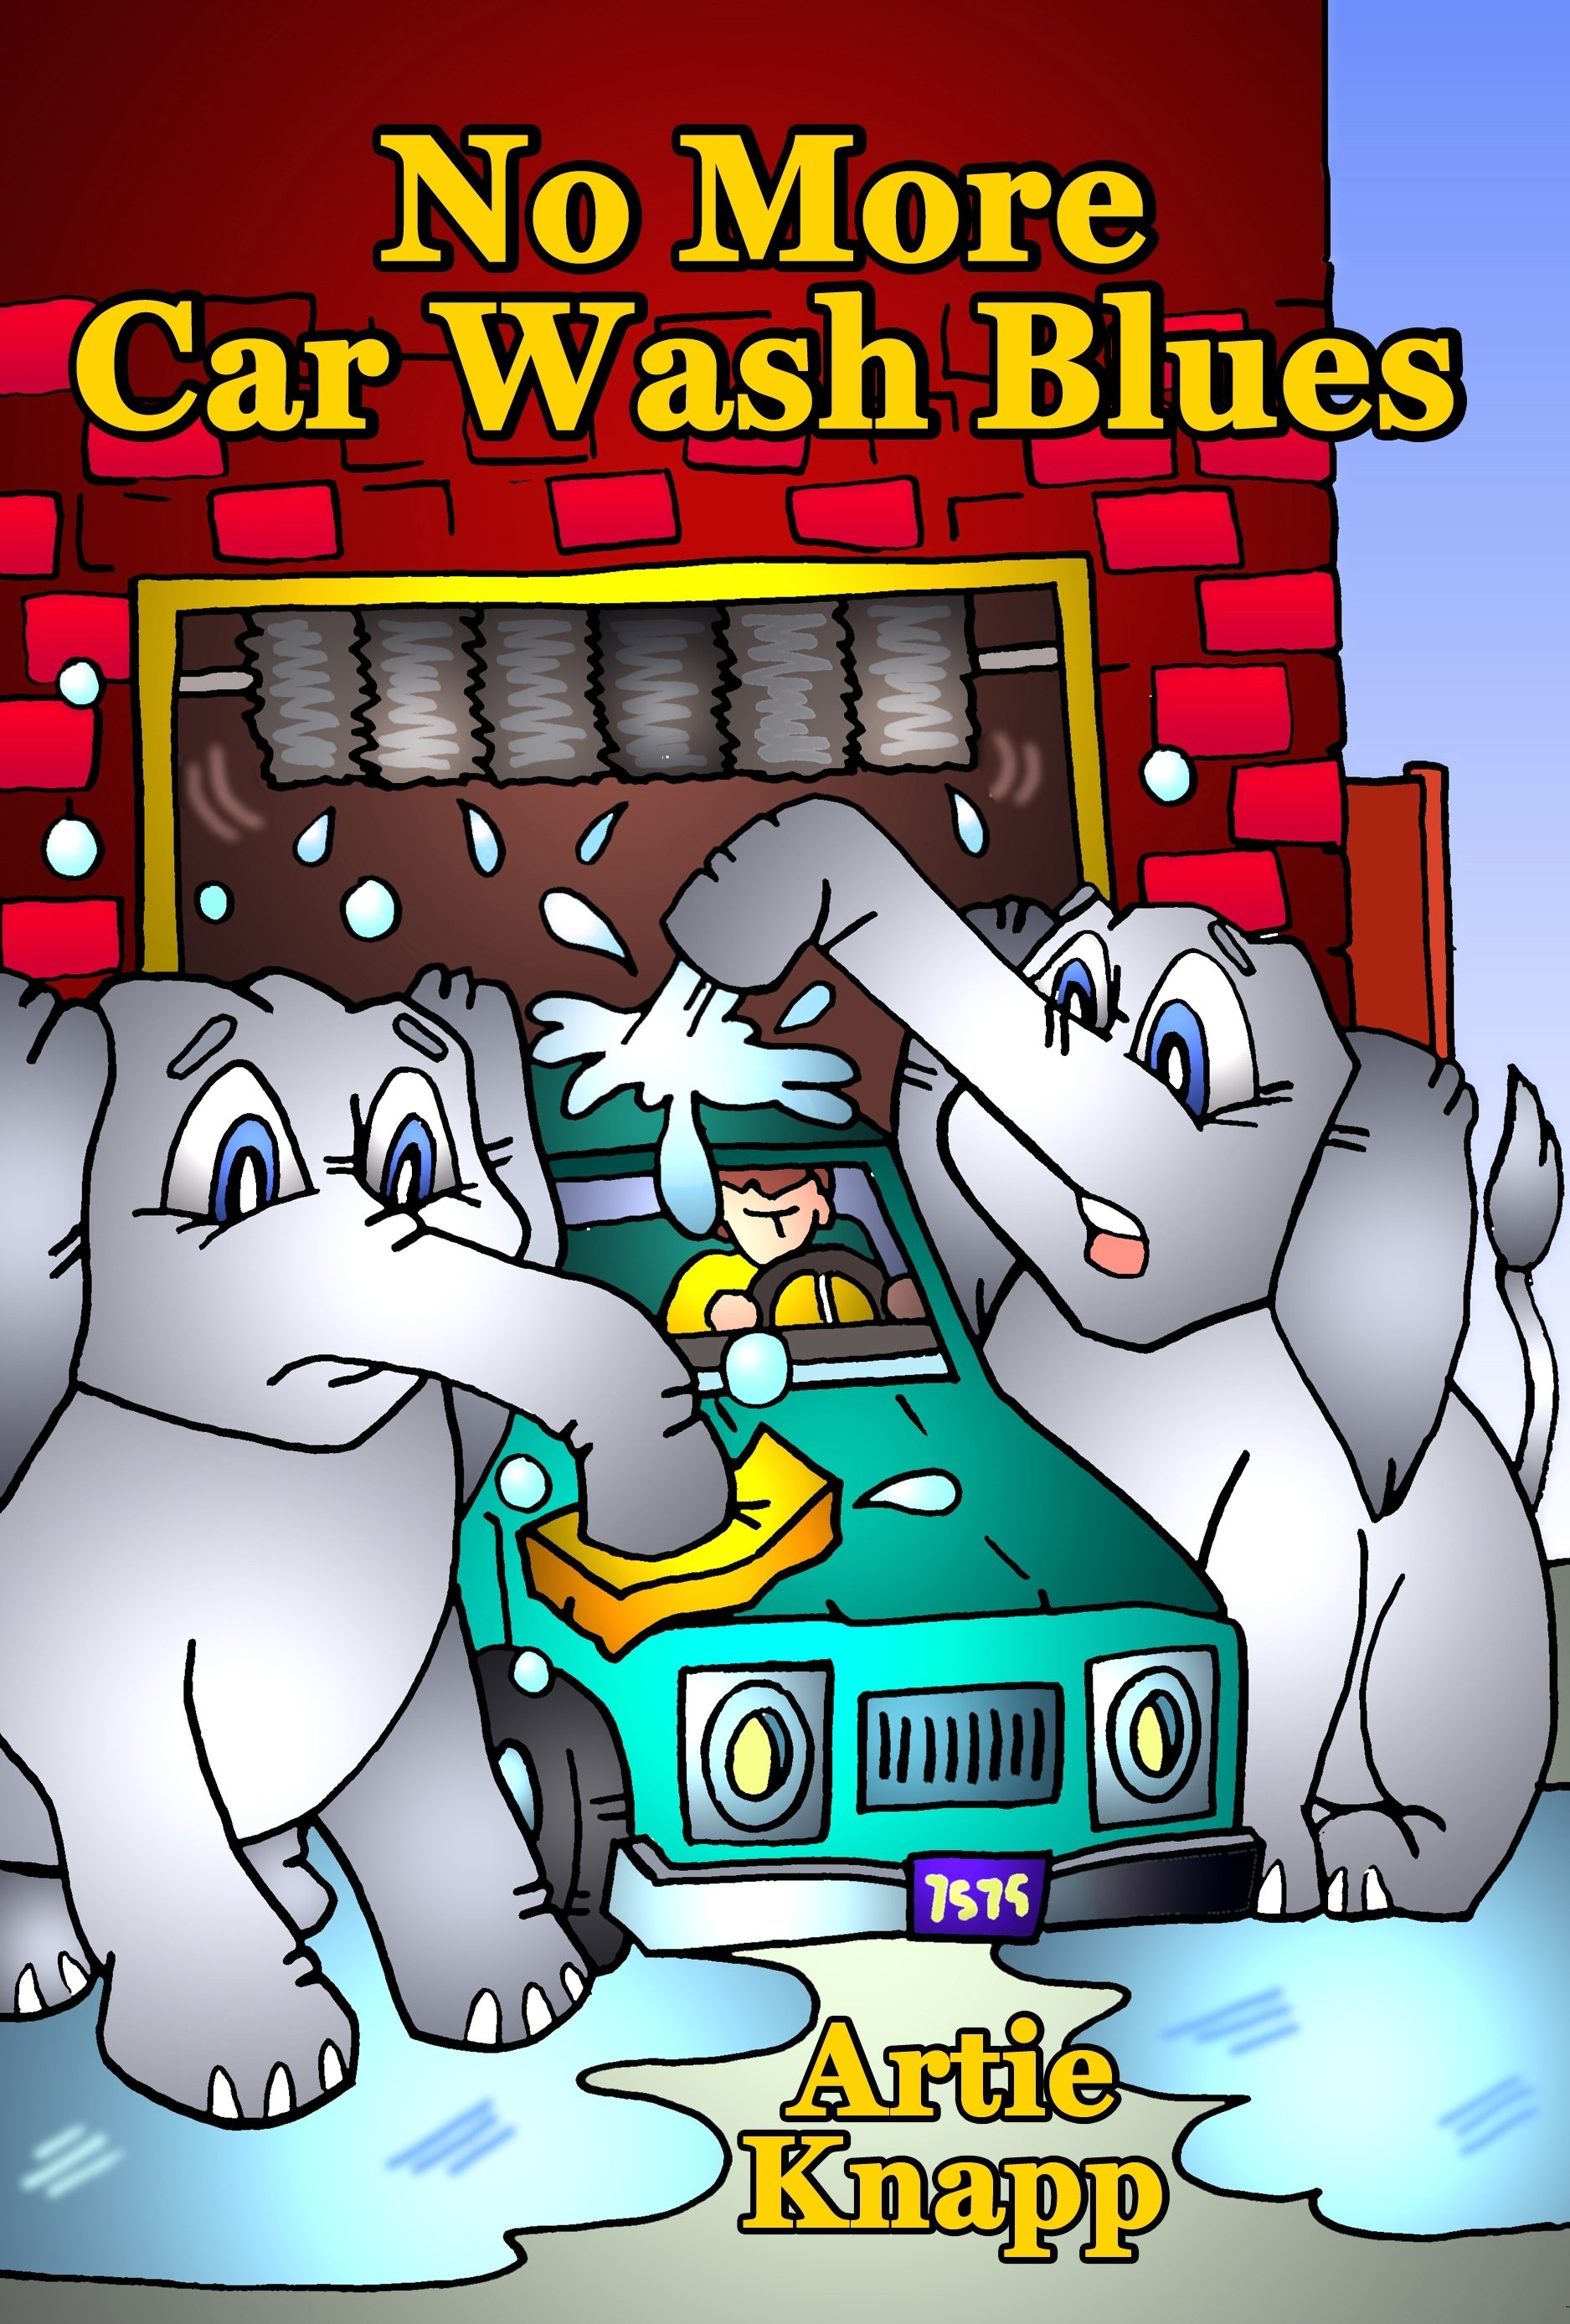 Elephants car washing